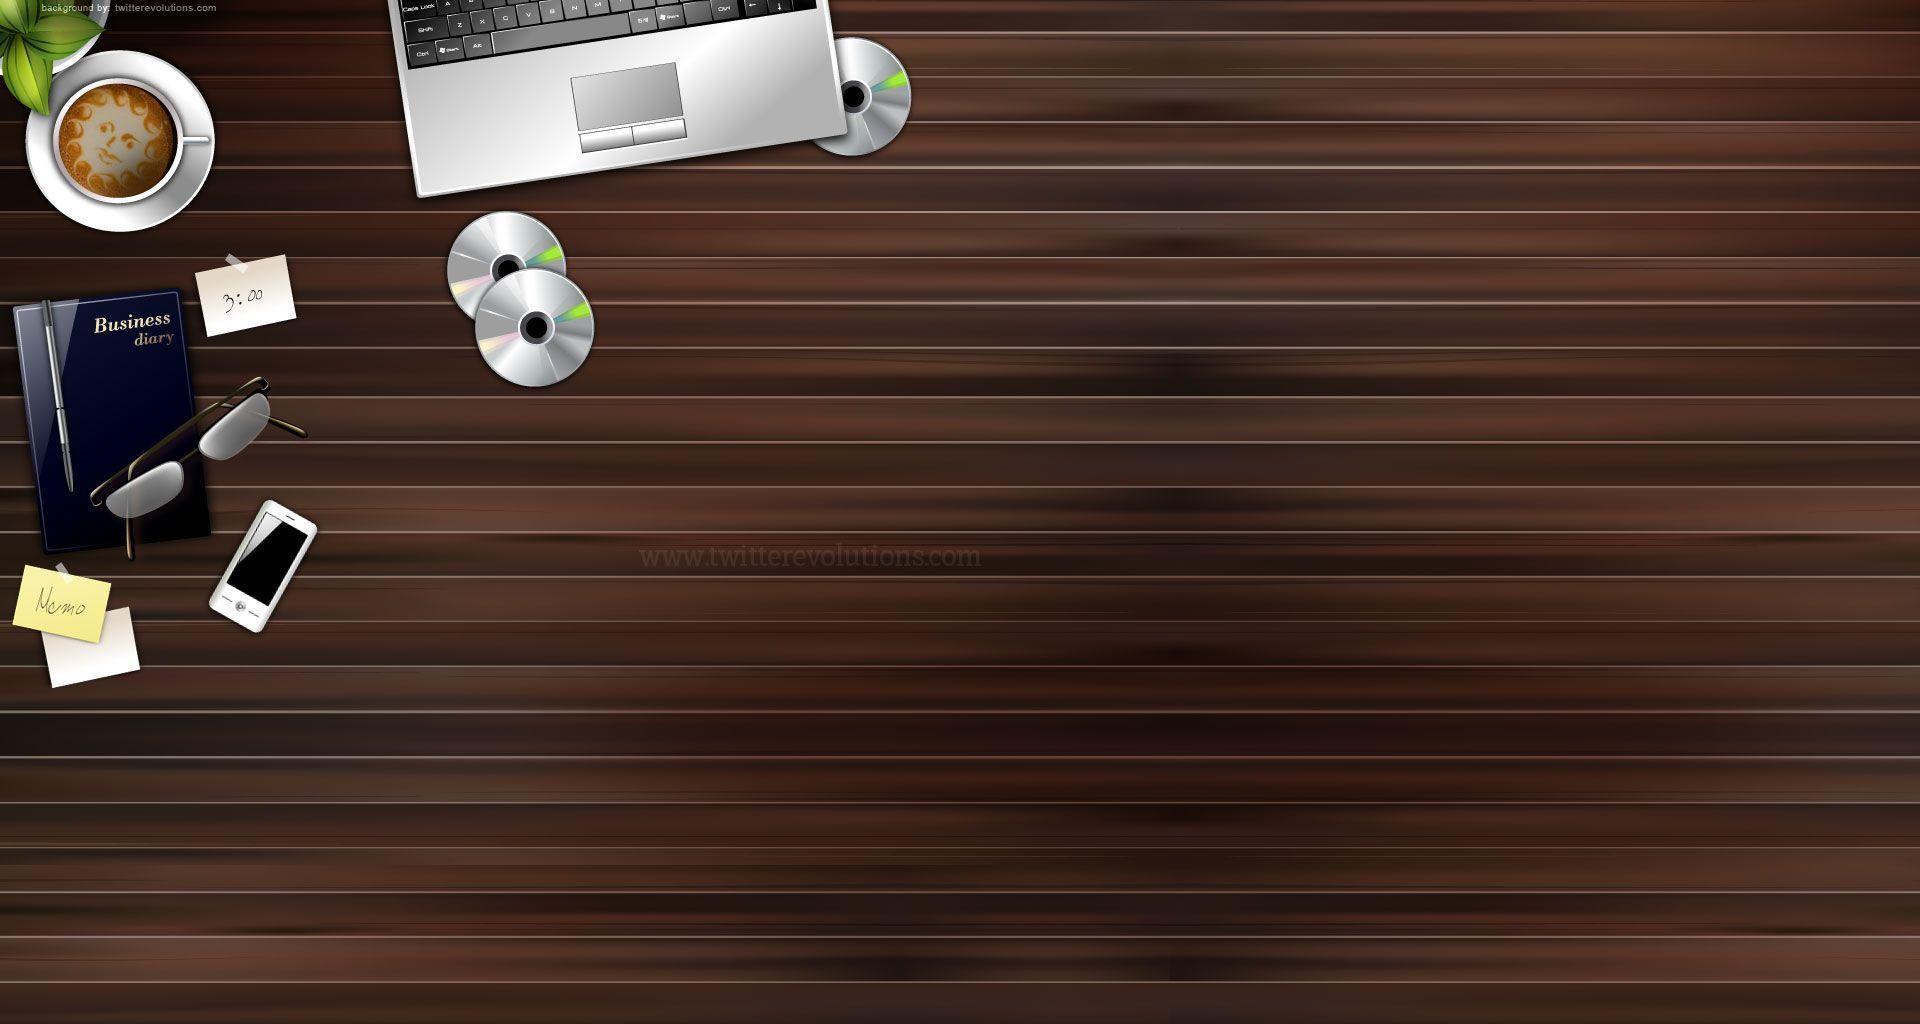 Desk Backgrounds Pictures Wallpaper Cave